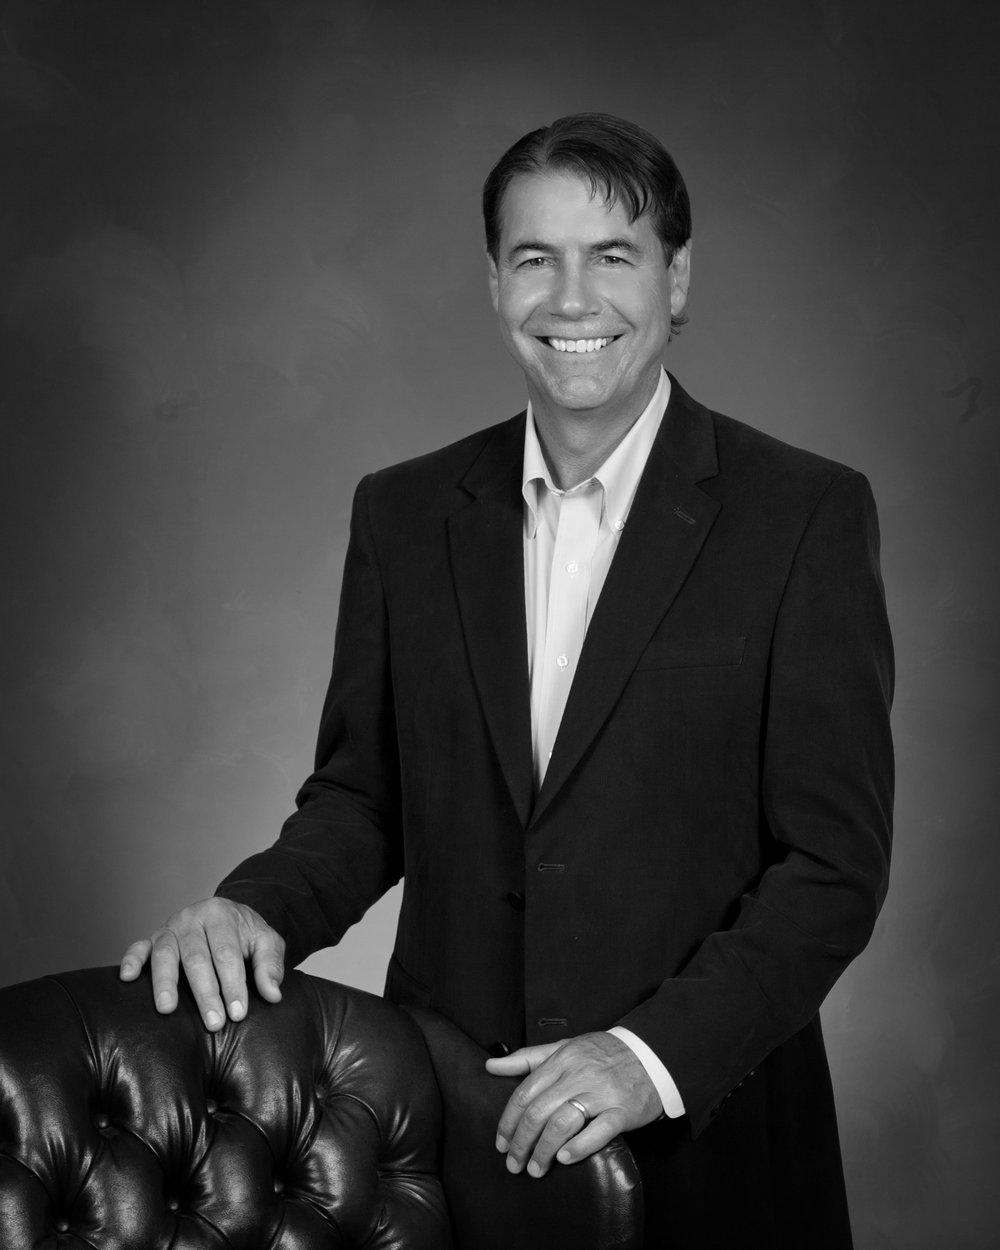 Lincoln's Law Advocate | Brian Wojtalewicz